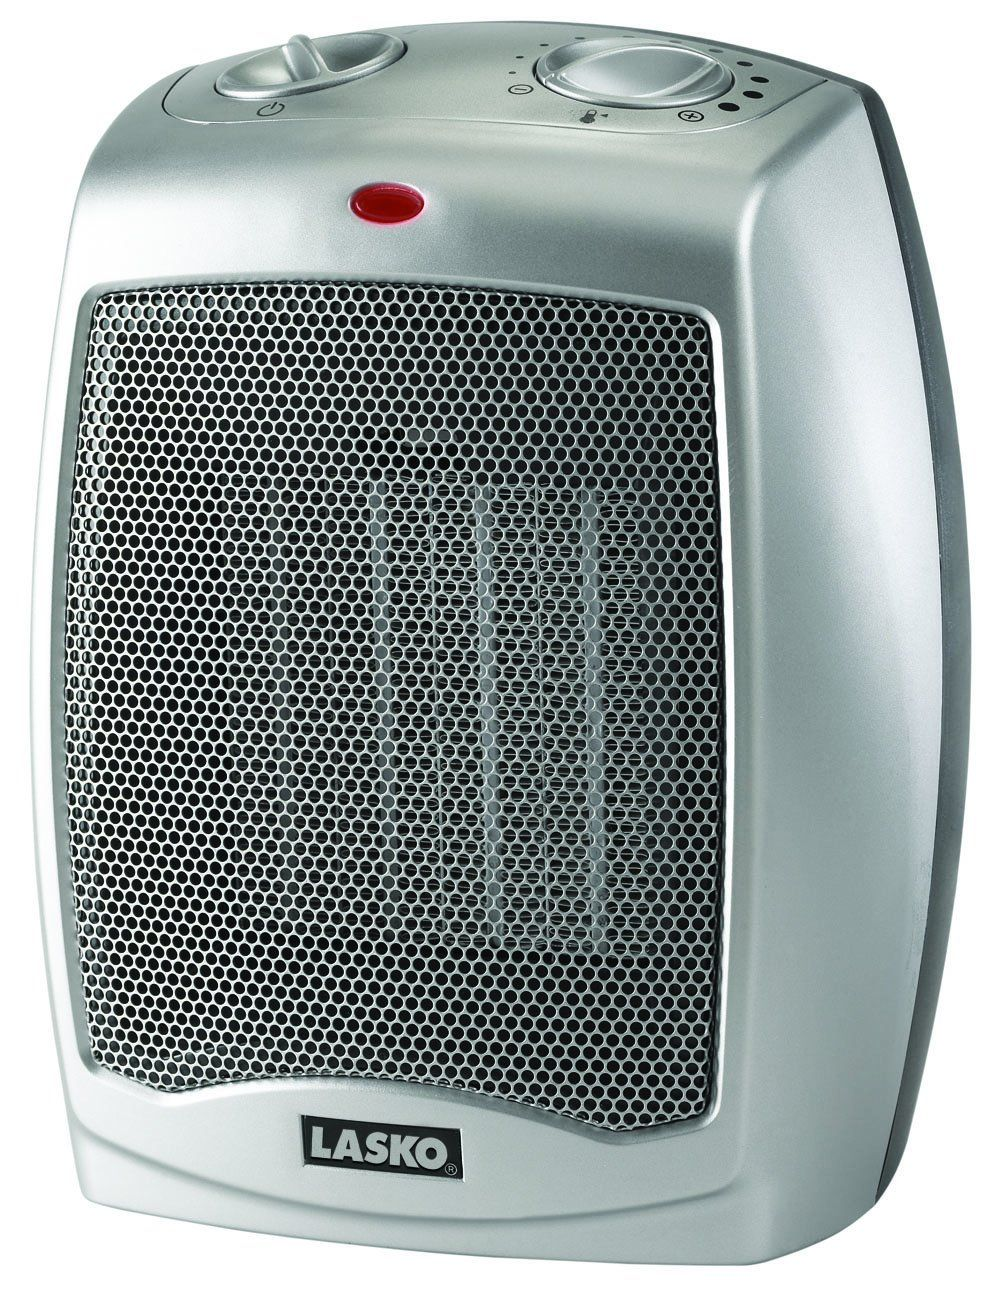 Amazon Com Lasko 754200 Ceramic Heater With Adjustable Thermostat Space Heaters Heater Thermostat Portable Heater Portable Space Heater